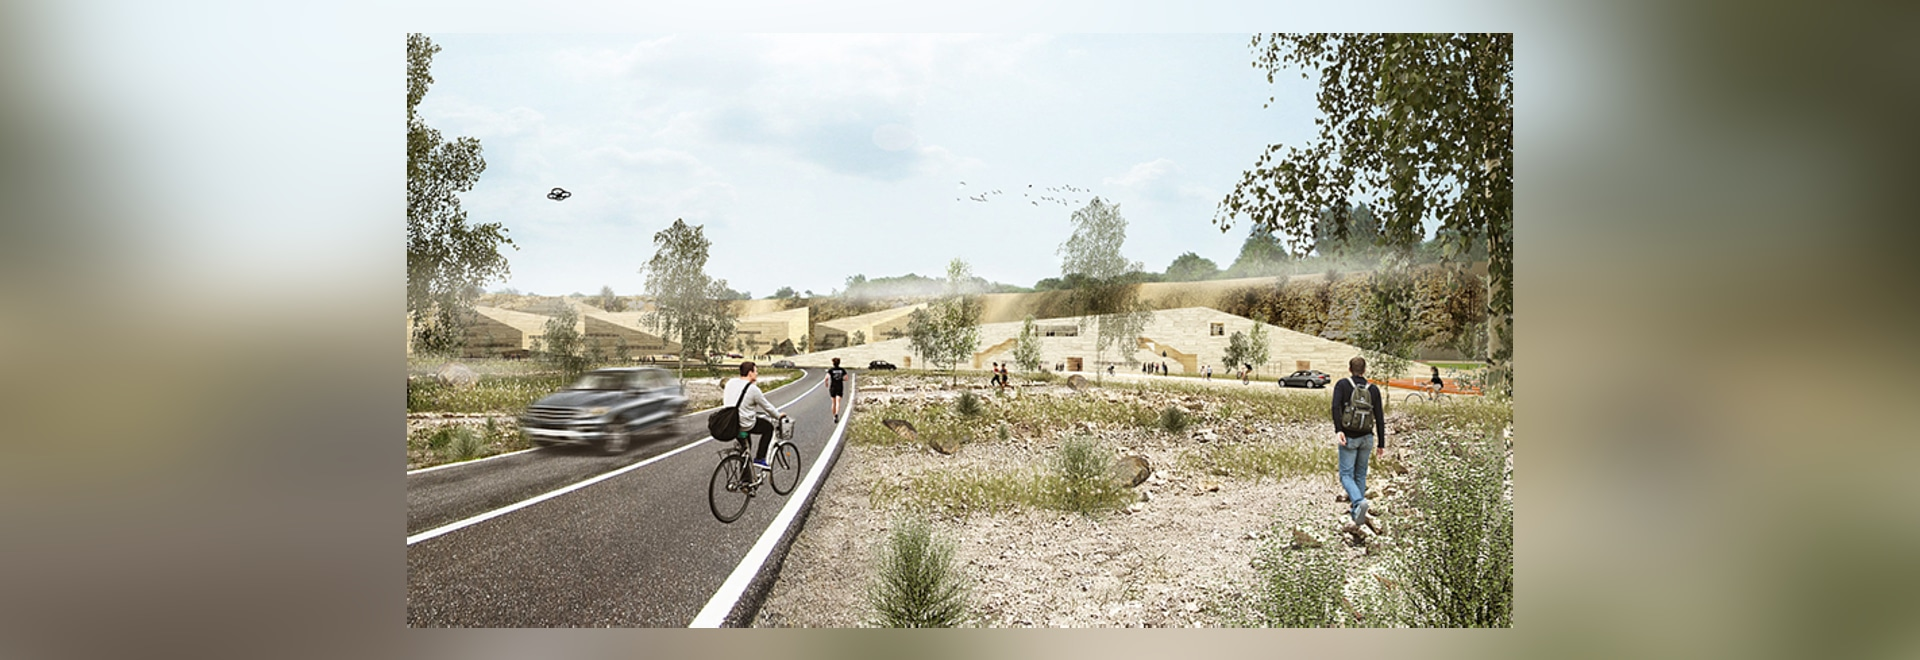 mateusz tanski chosen to design new sports complex in poland